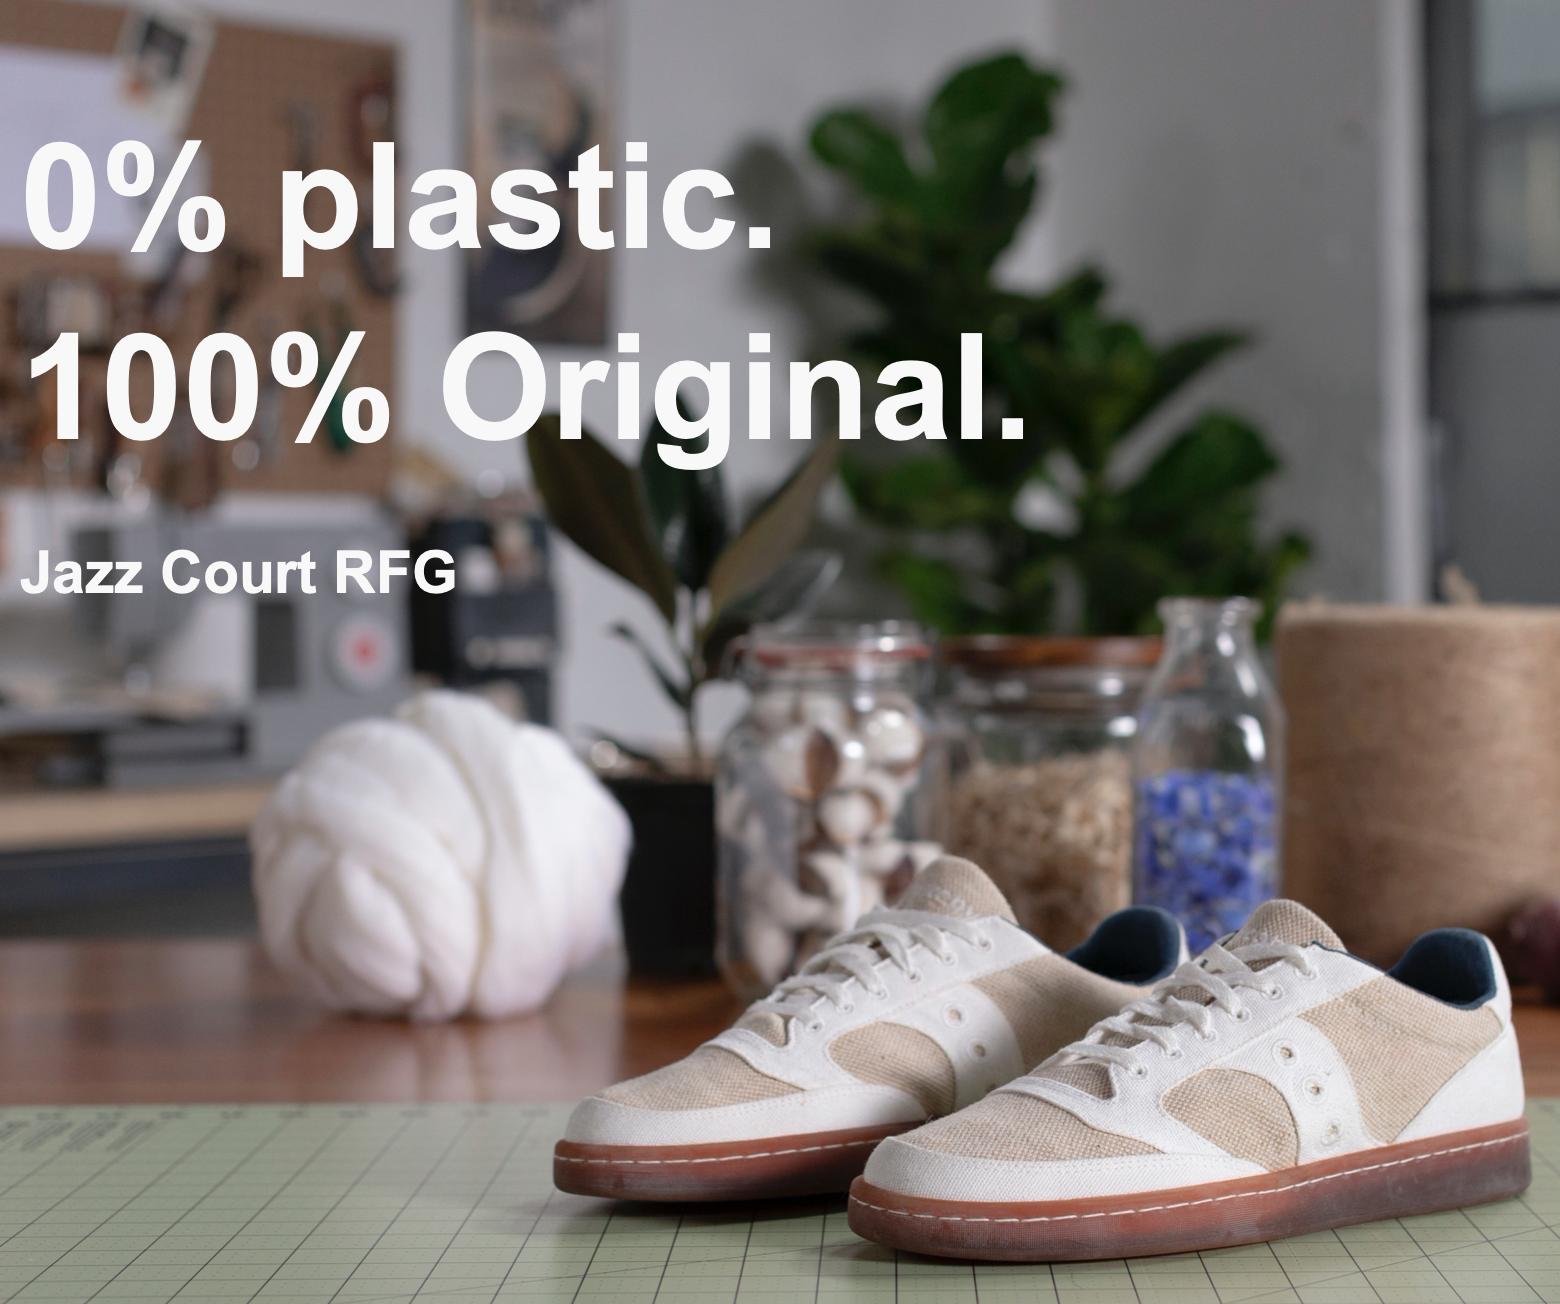 Saucony Jazz Court RFG 0% Plastic (Naturel Gum) S70562-1